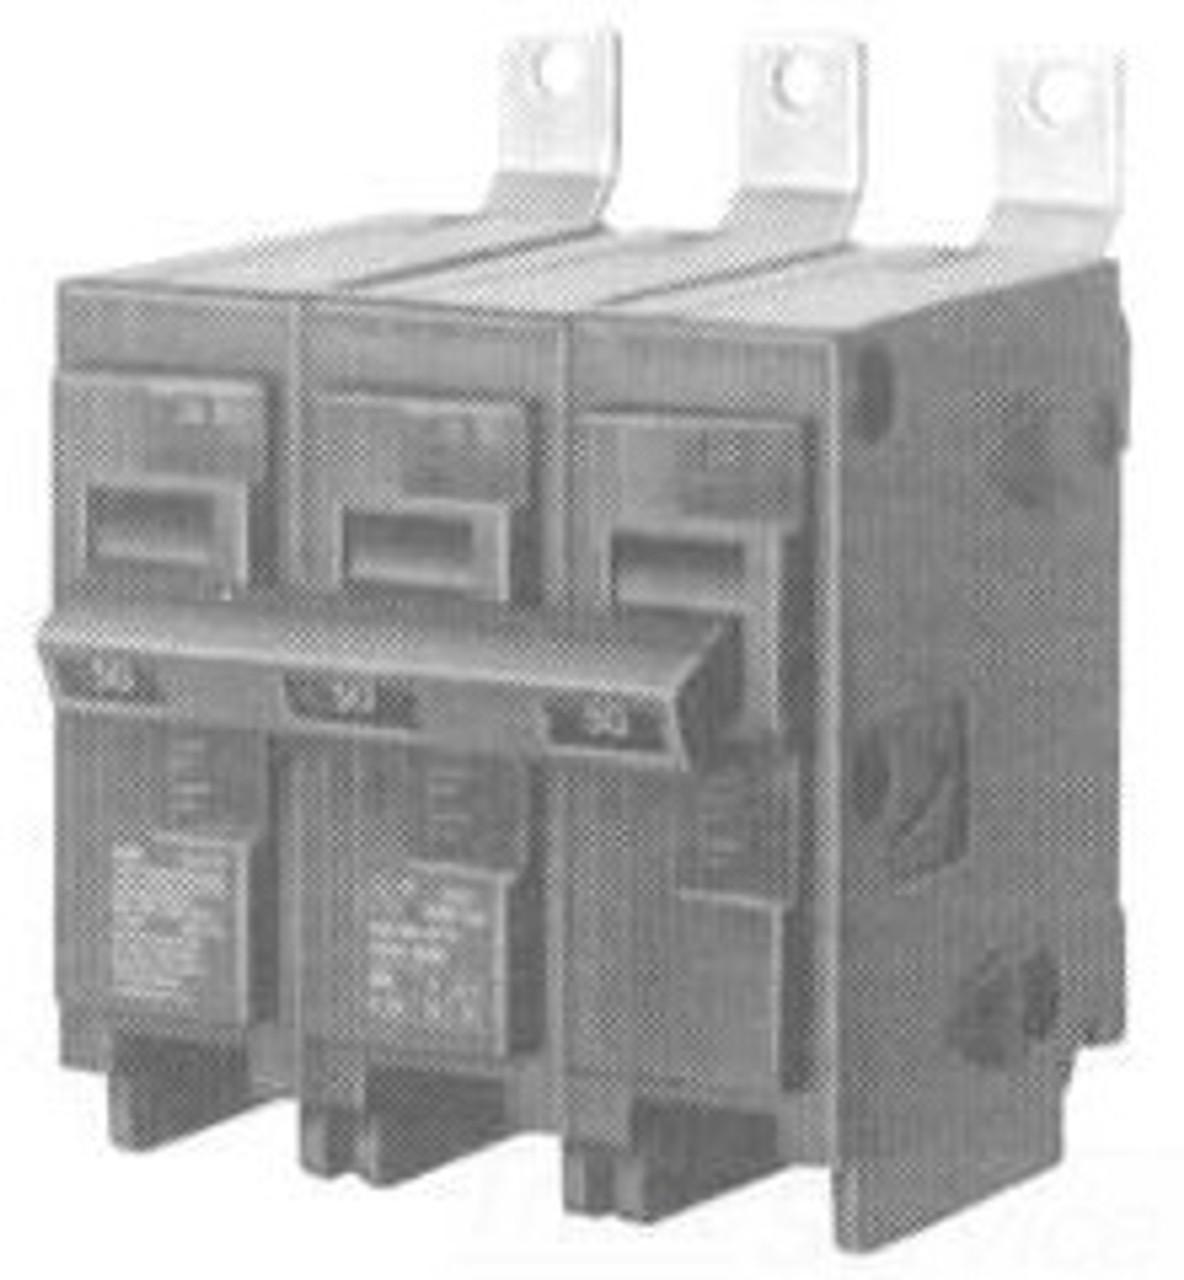 Siemens B360HH 3 Pole 60 Amp 240V 65K Type BL Circuit Breaker - Used